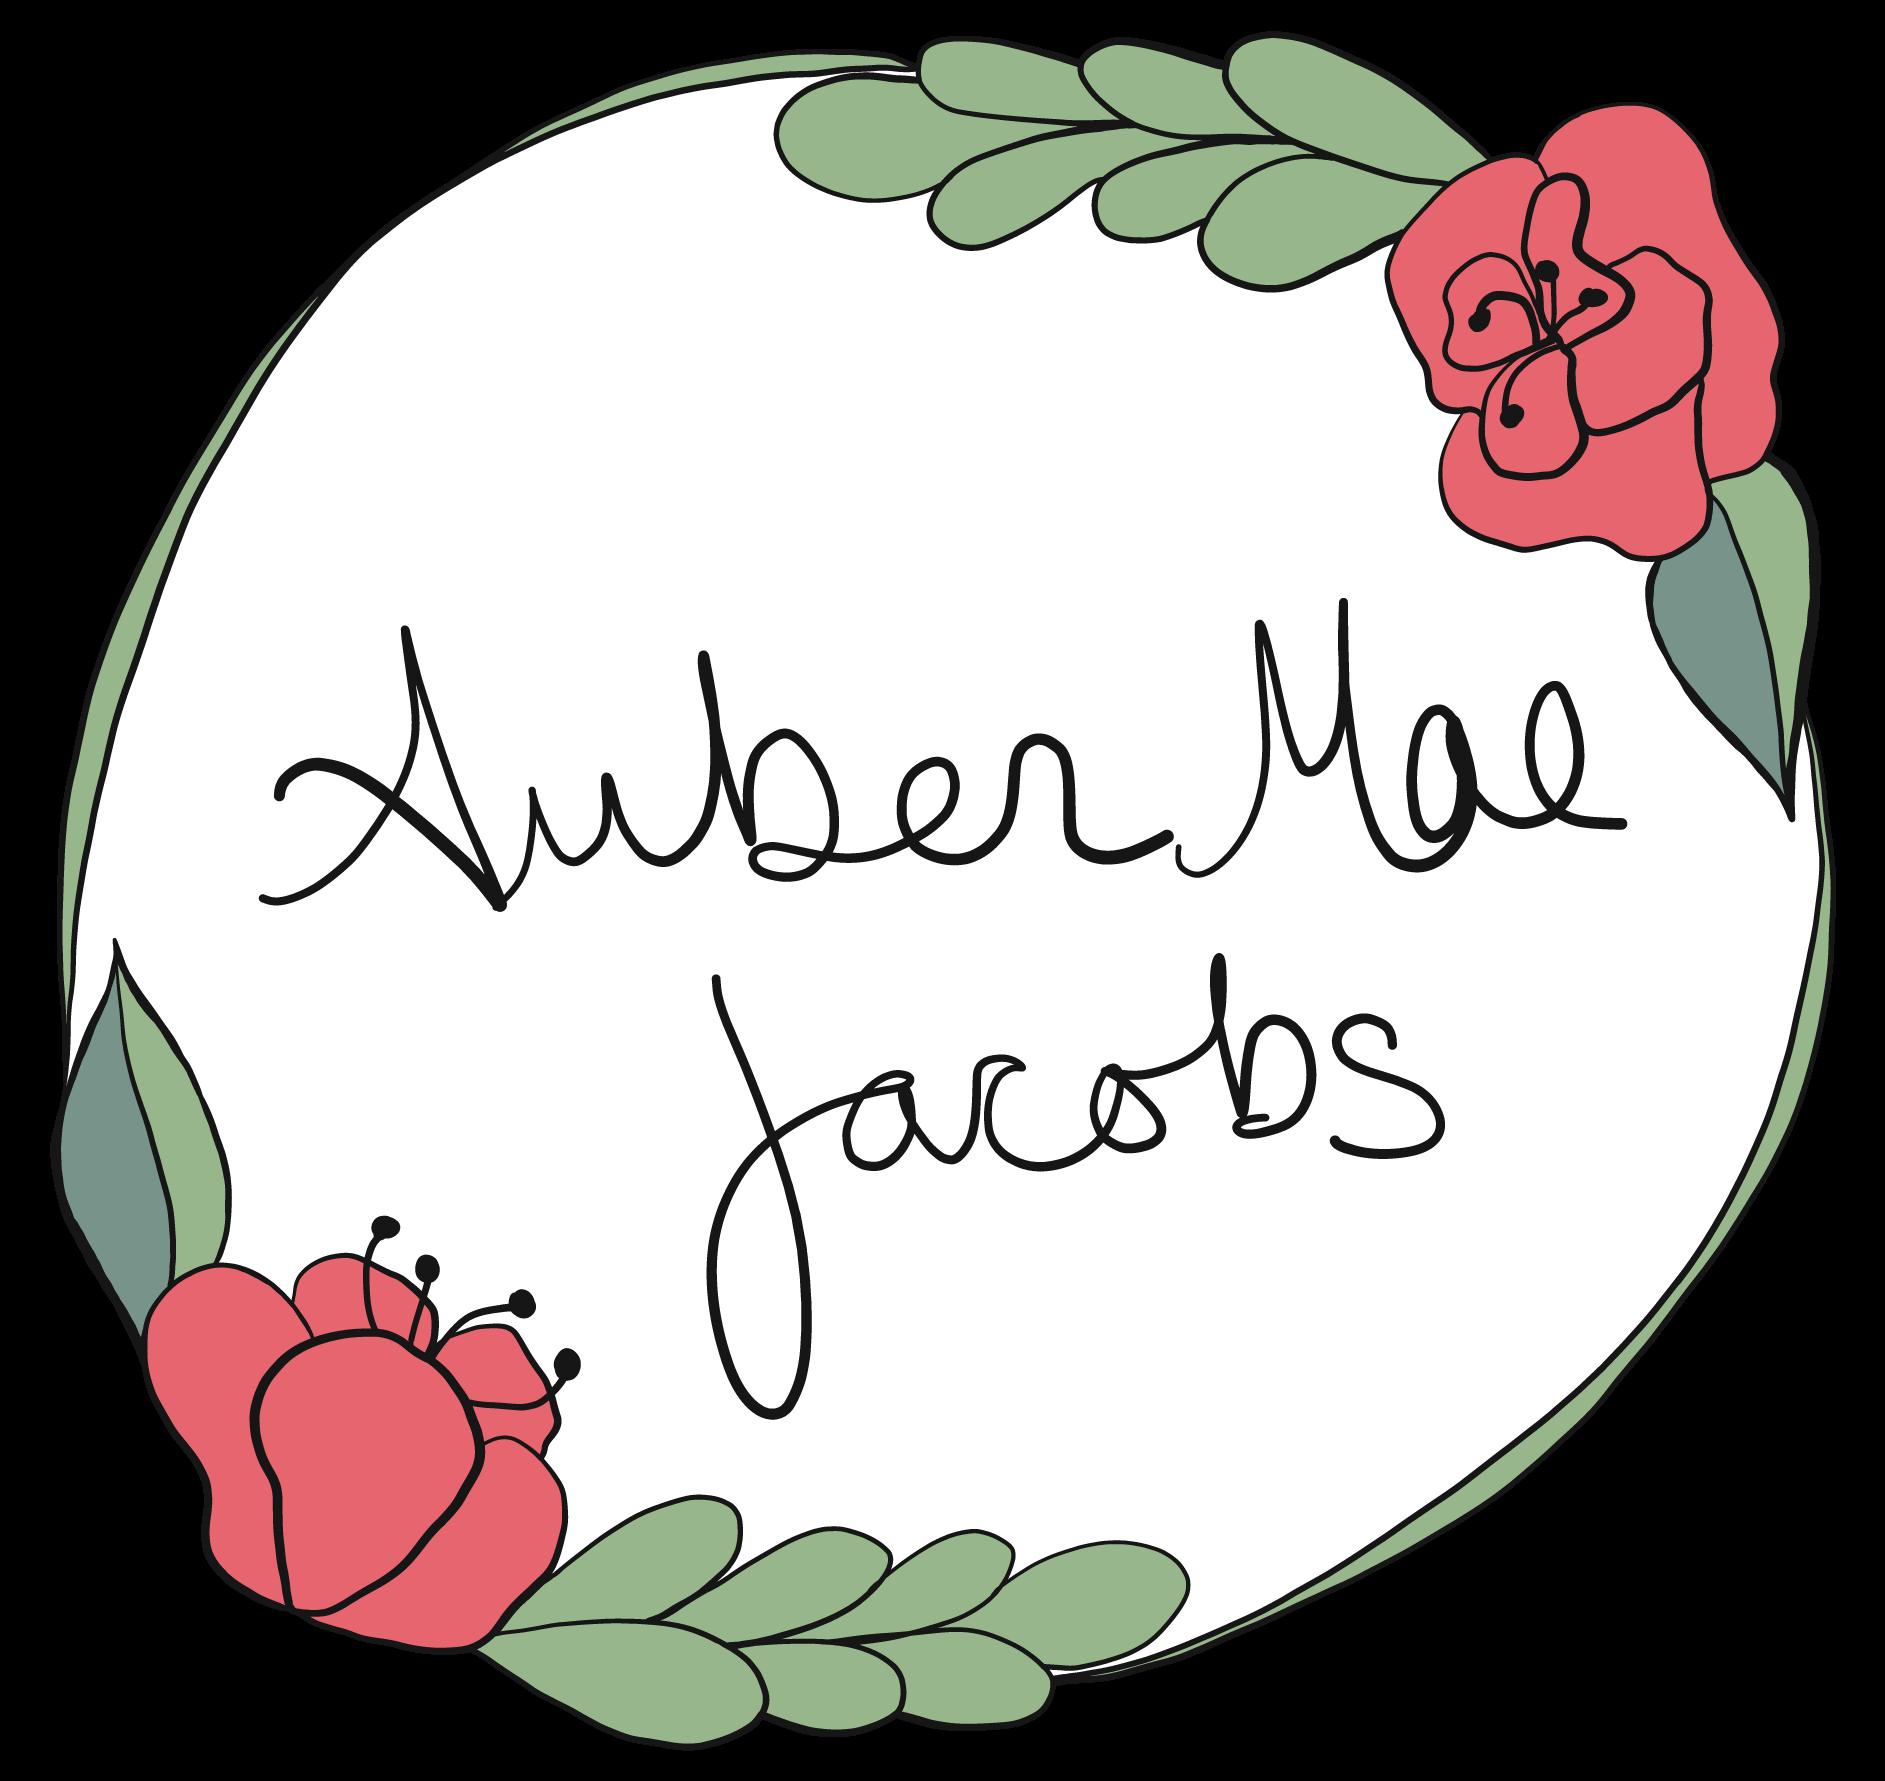 Amber Mae Jacobs